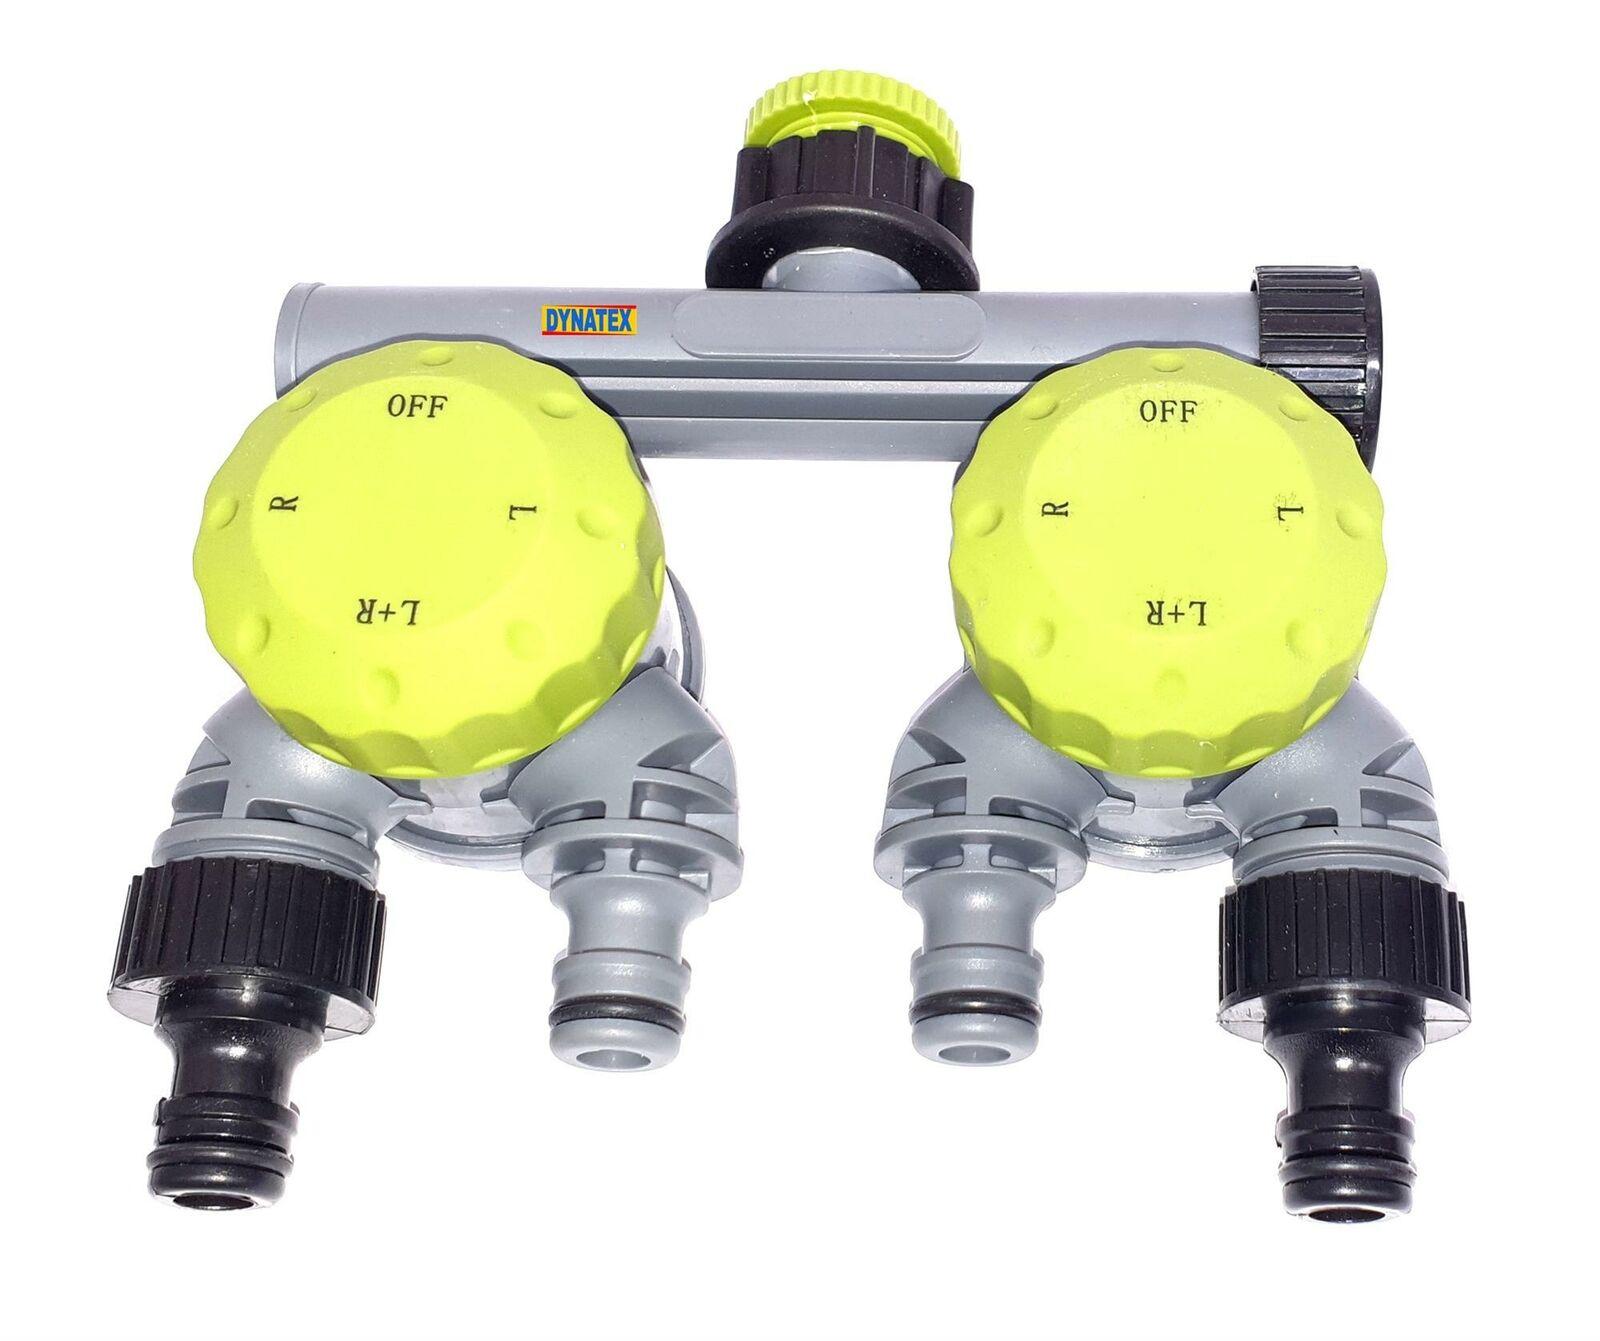 4 Way Tap Connector Garden Manifold Hose Pipe Splitter Adapter Water Faucet 1/2